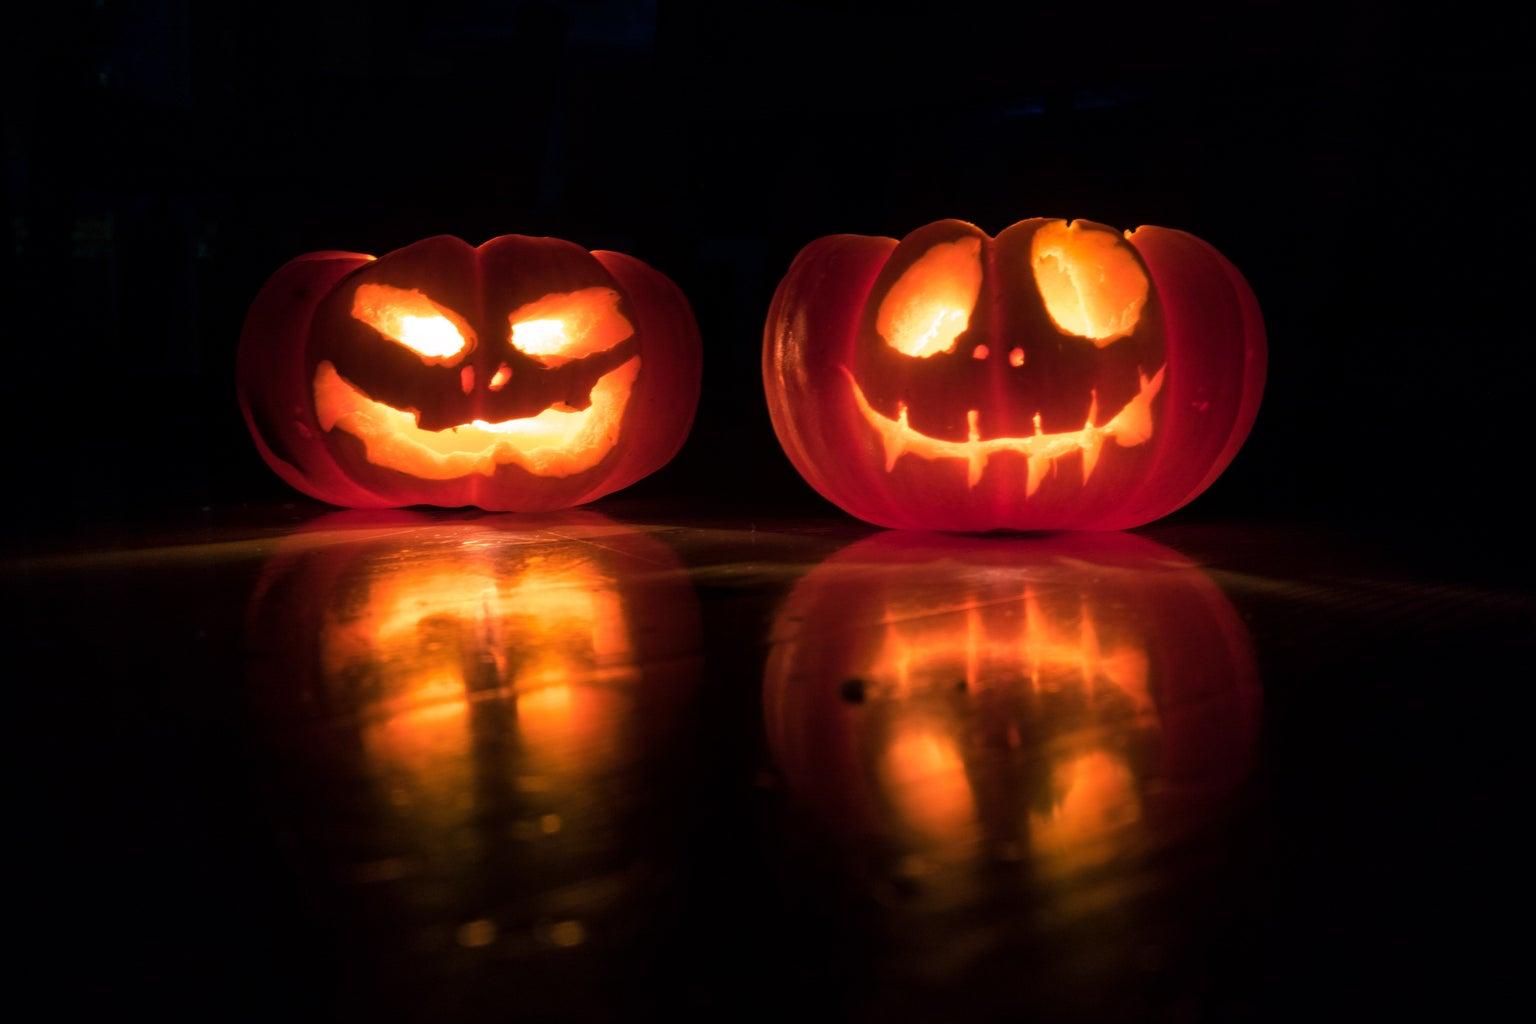 2 jack-o-lanterns in the dark